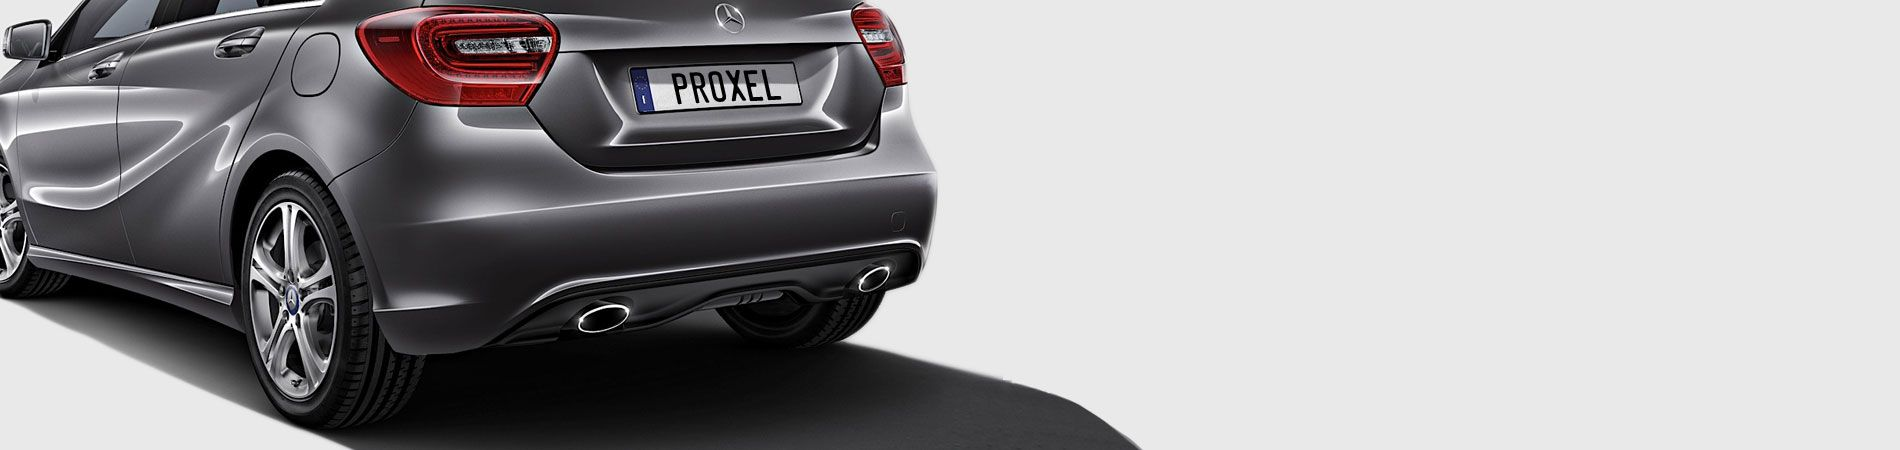 sensores-aparcamiento-proxel-eps-home